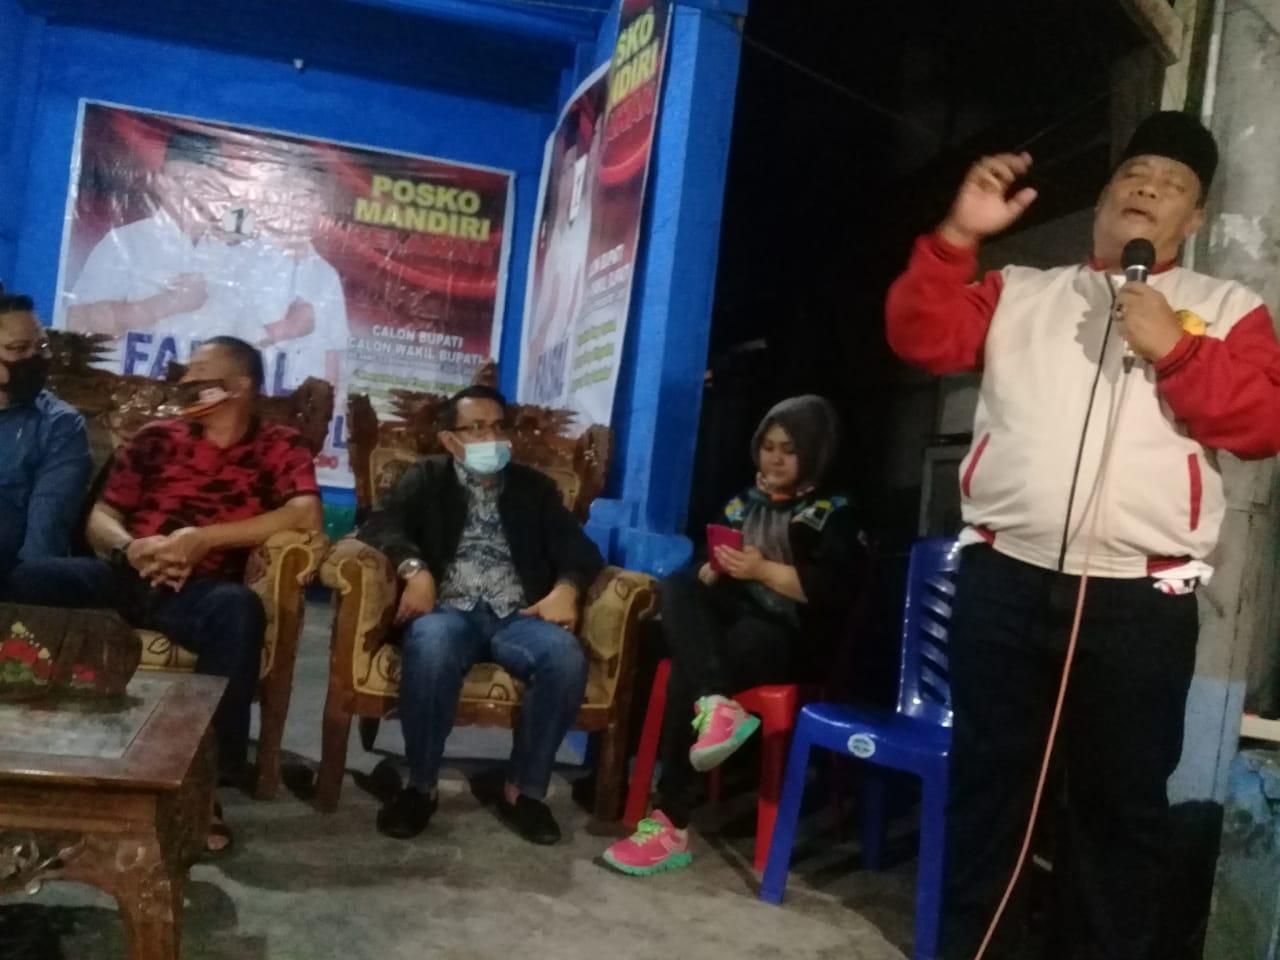 M. Ali ST, Koalisi Siap Menangkan Faisal-Fatrol, Hentikan PK5 Berteduhkan Langit